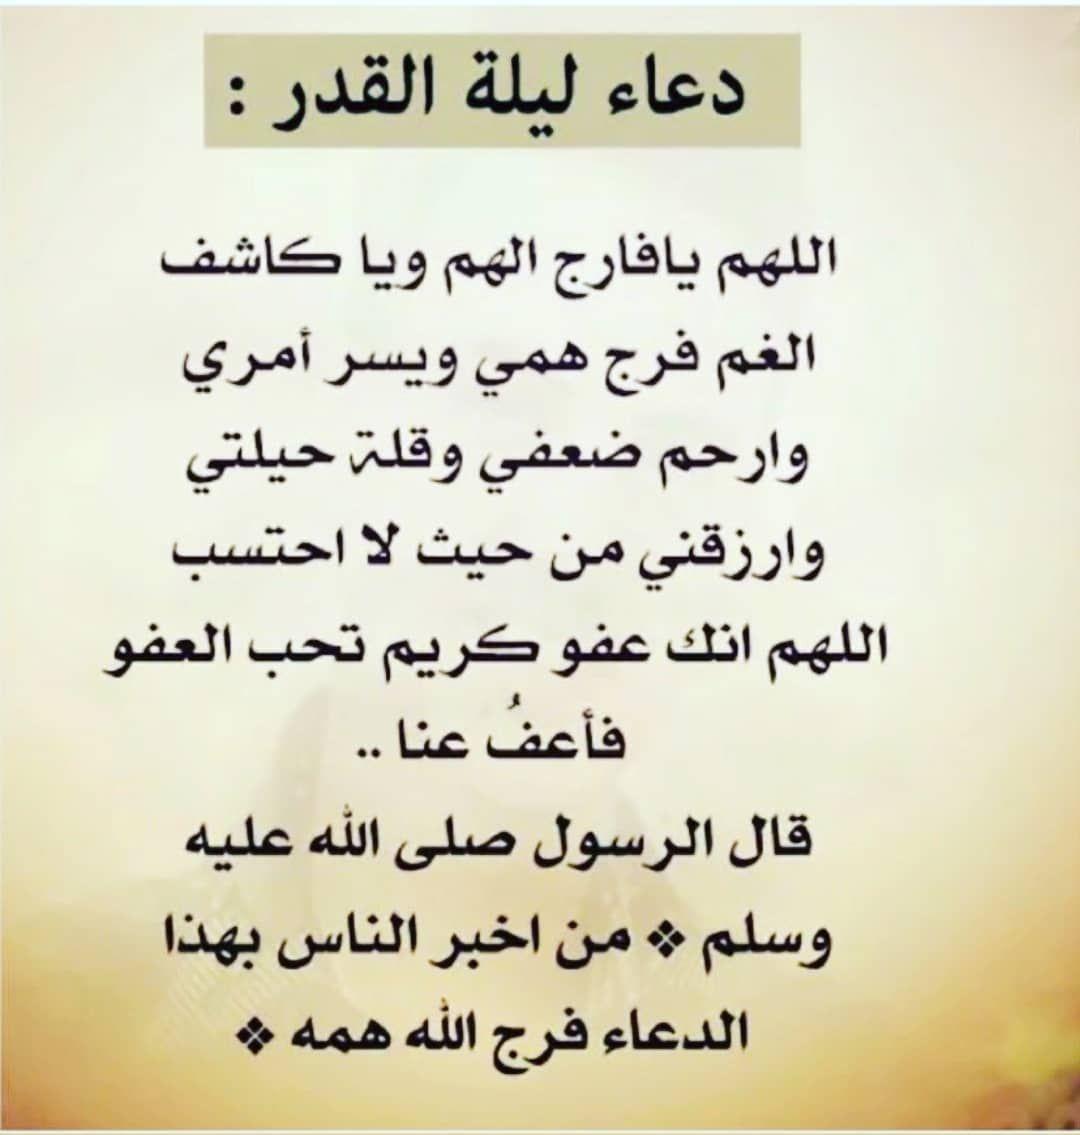 Dz Algerie Algeria Alger Bejaia Oran Constantine Annaba الجزائر Kenzamorsli Soolking Amelboucho Quran Quotes Inspirational Butterfly Love Quotes Islamic Quotes